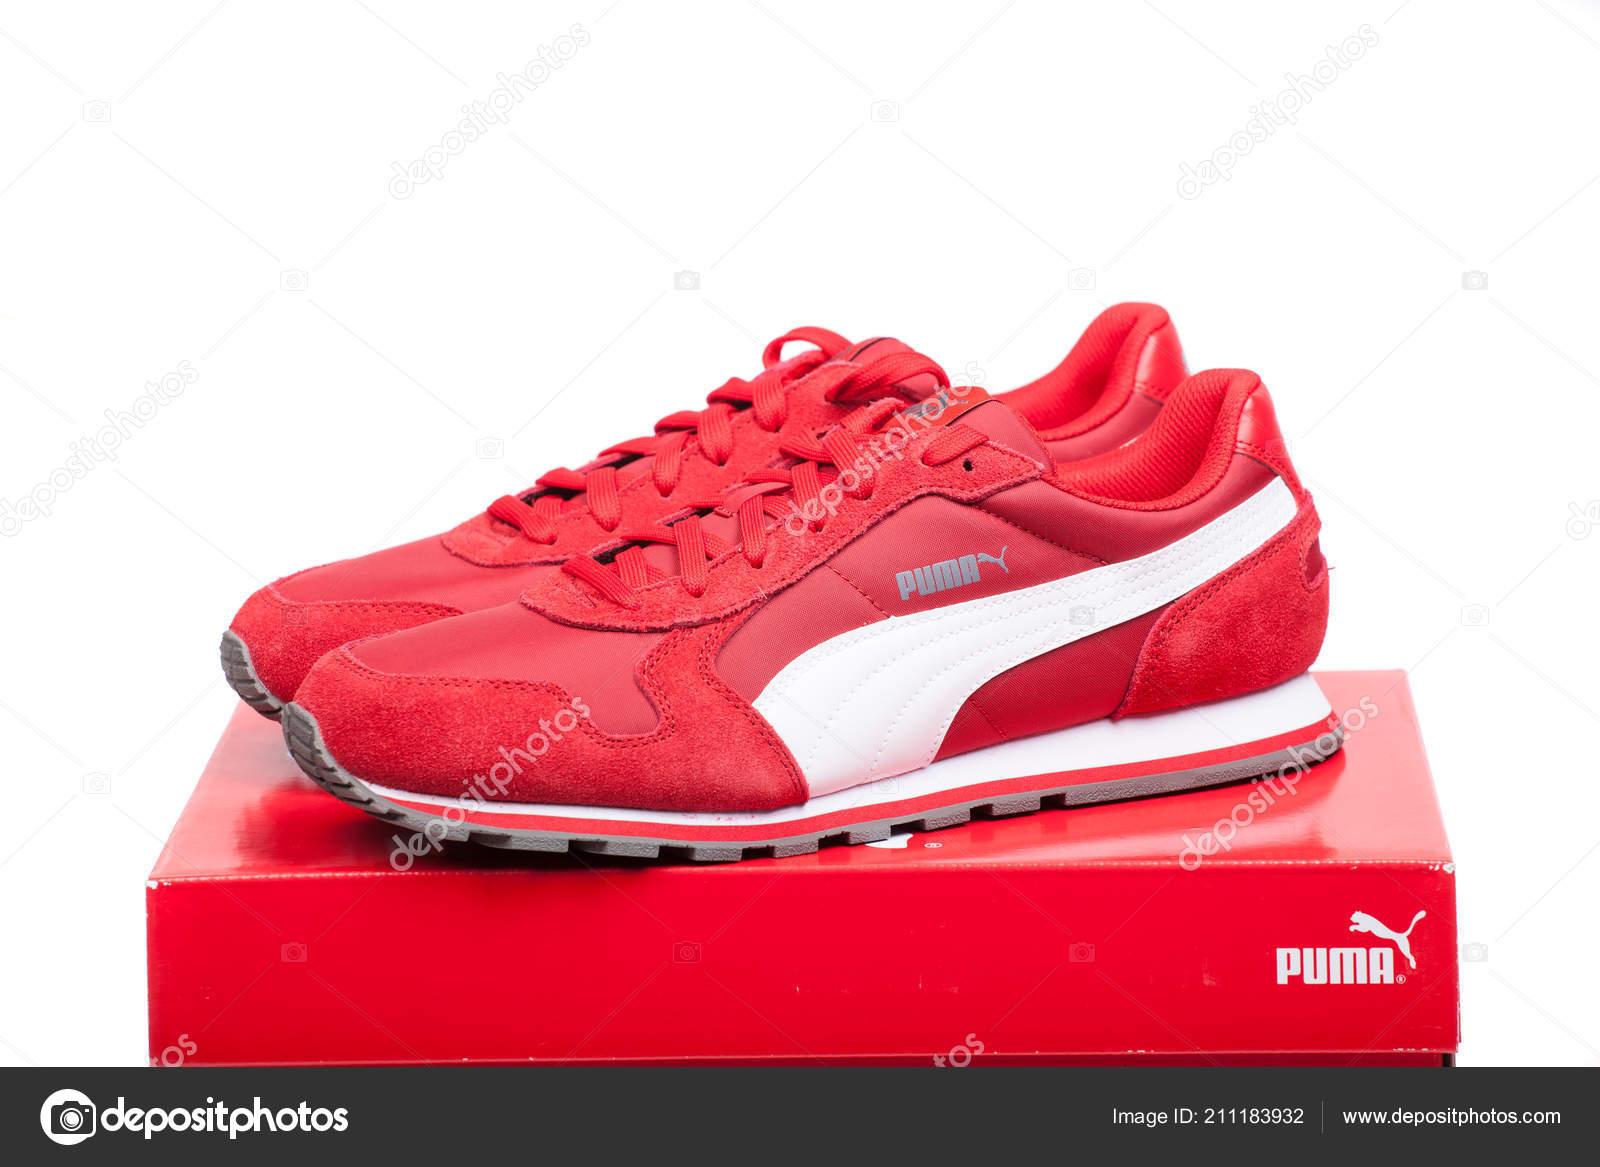 Del 2017 Roja Varna Junio Rojo Bulgaria Caja Zapatos Puma F8fw68q